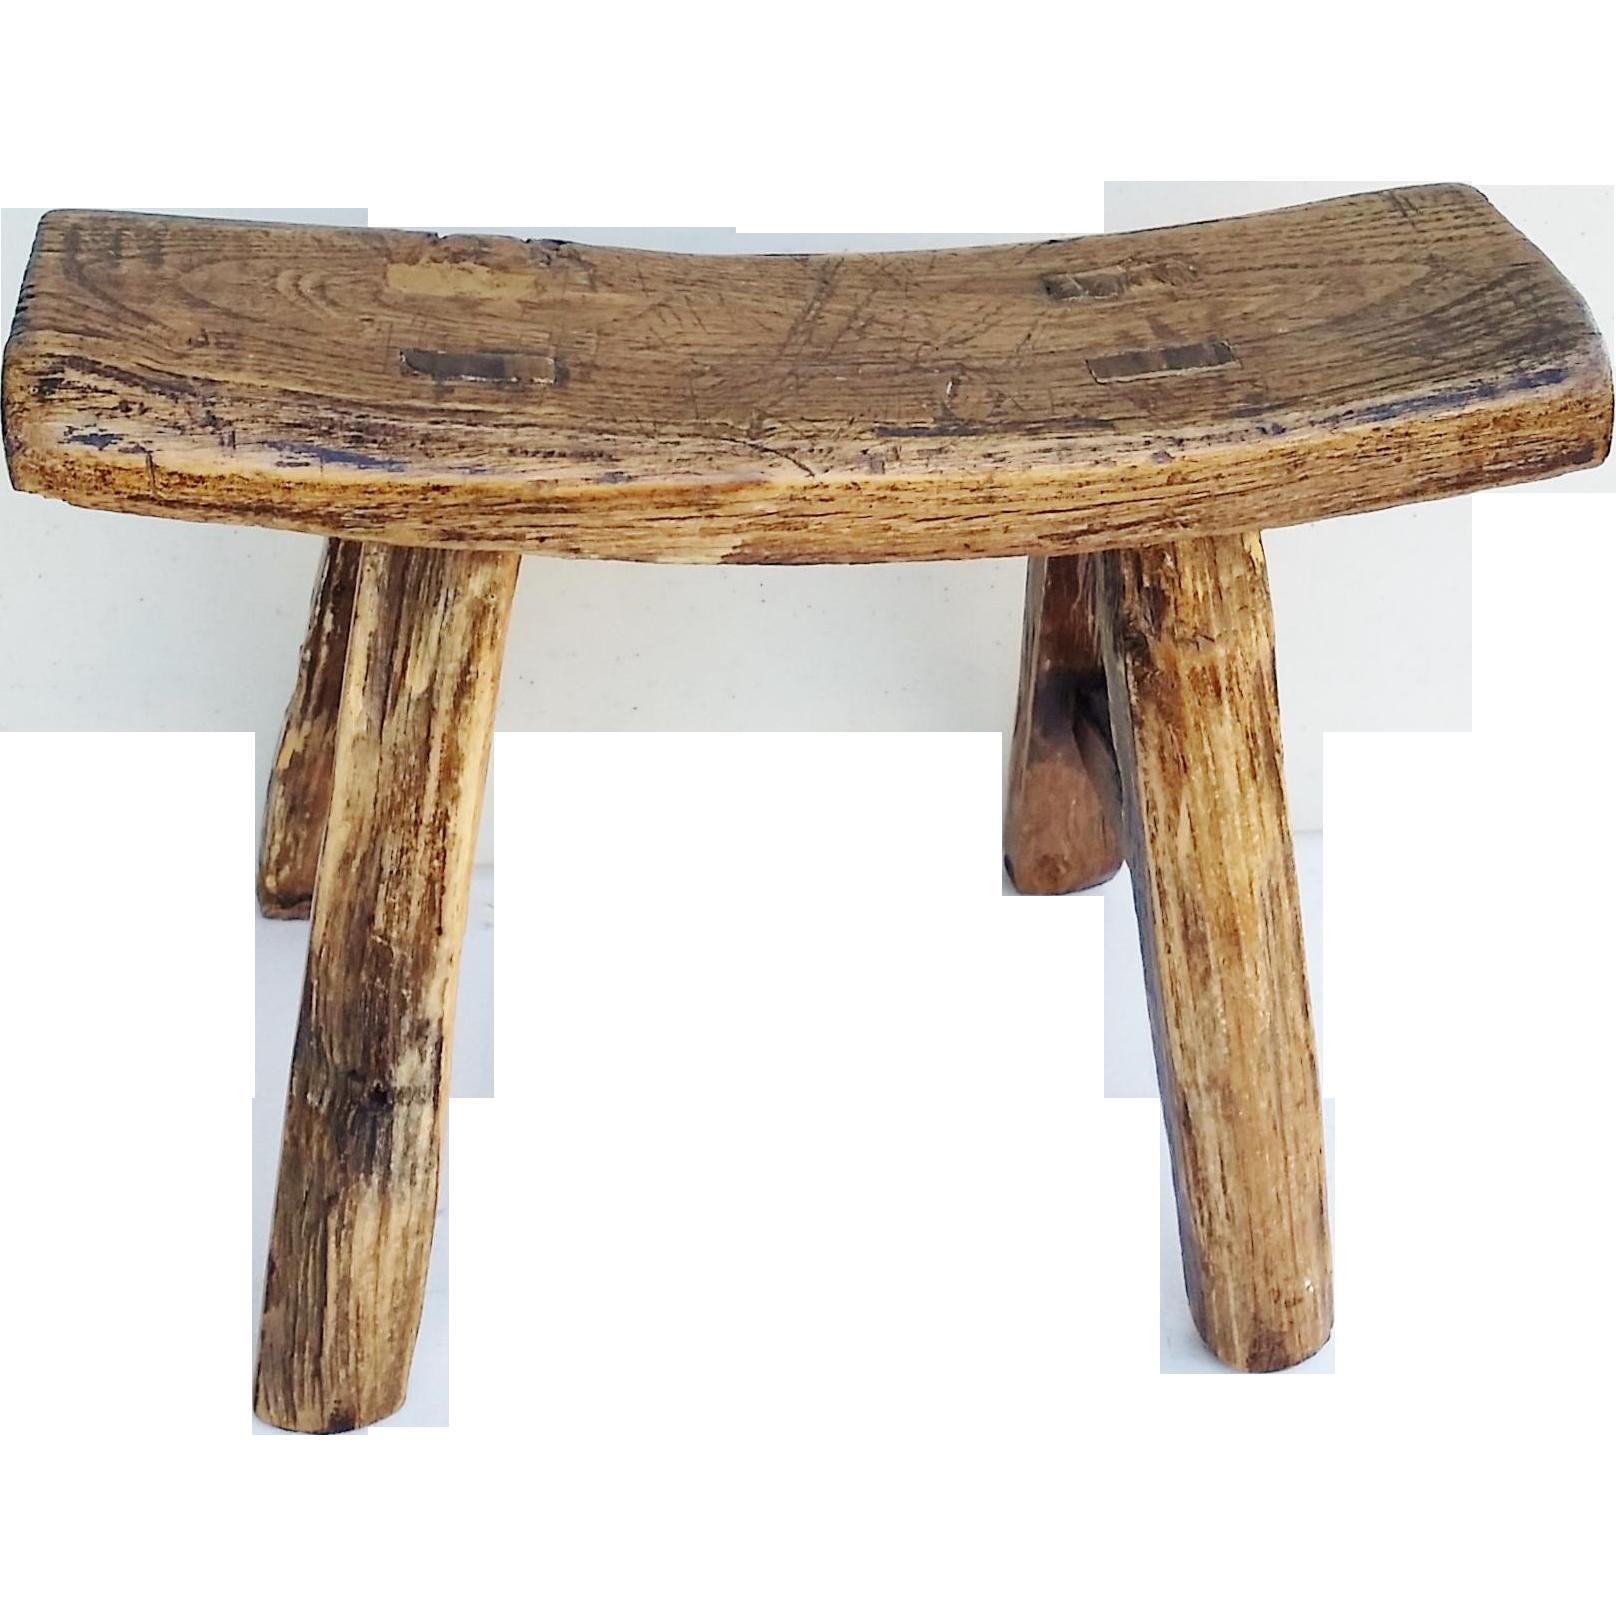 Vintage Chinese Elm Stool Milking Bench